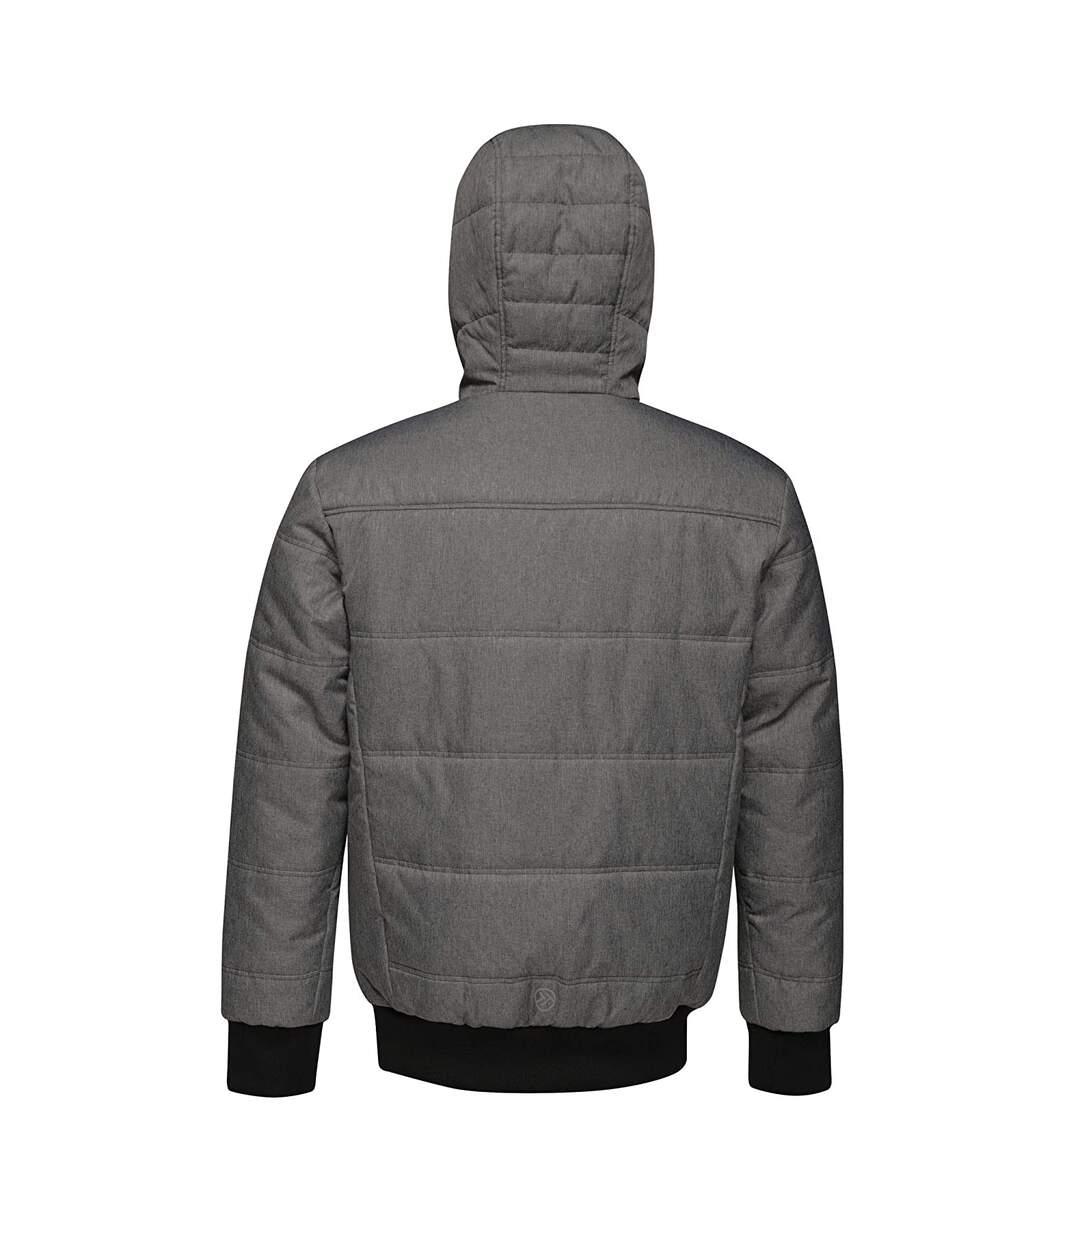 Regatta Mens Thrust Insulated Hooded Jacket (Blue Grey/Jet Black) - UTRG3746